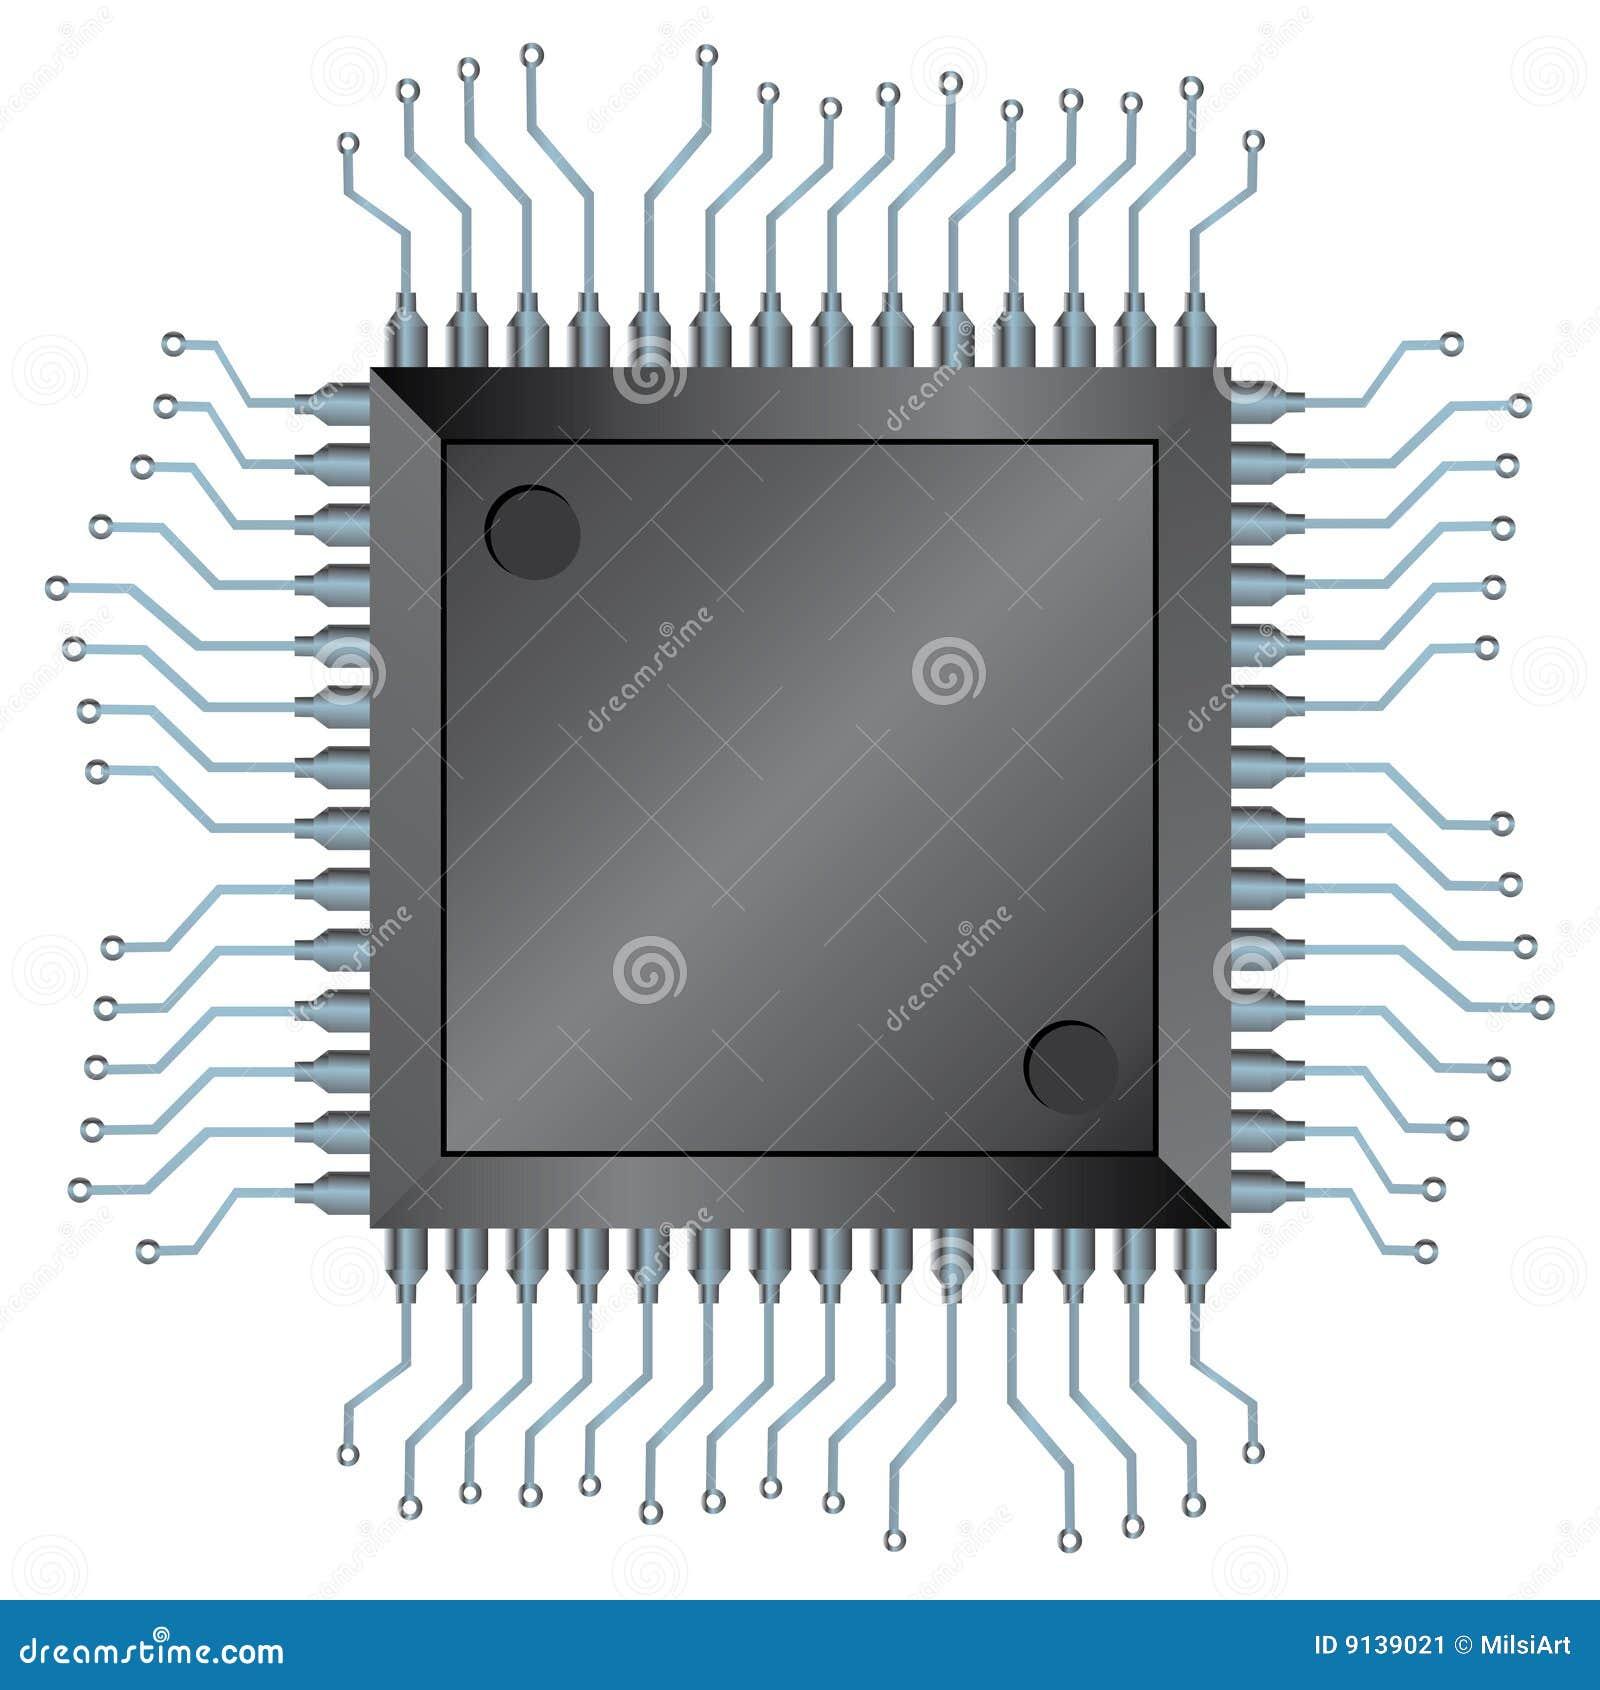 Microplaqueta do processador central